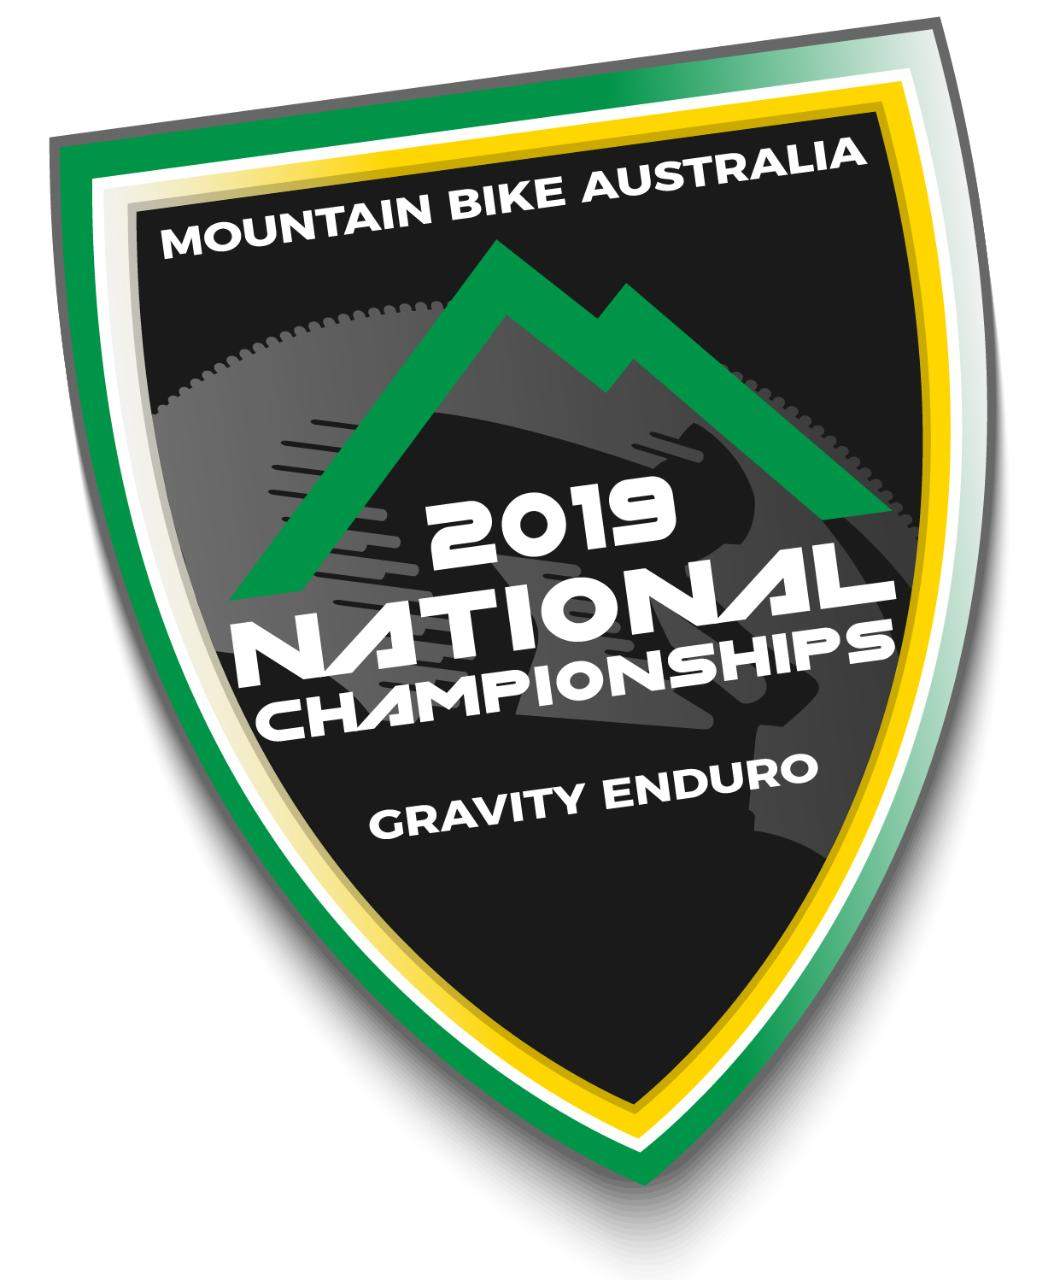 Gravity Enduro National Championship Junior Categories